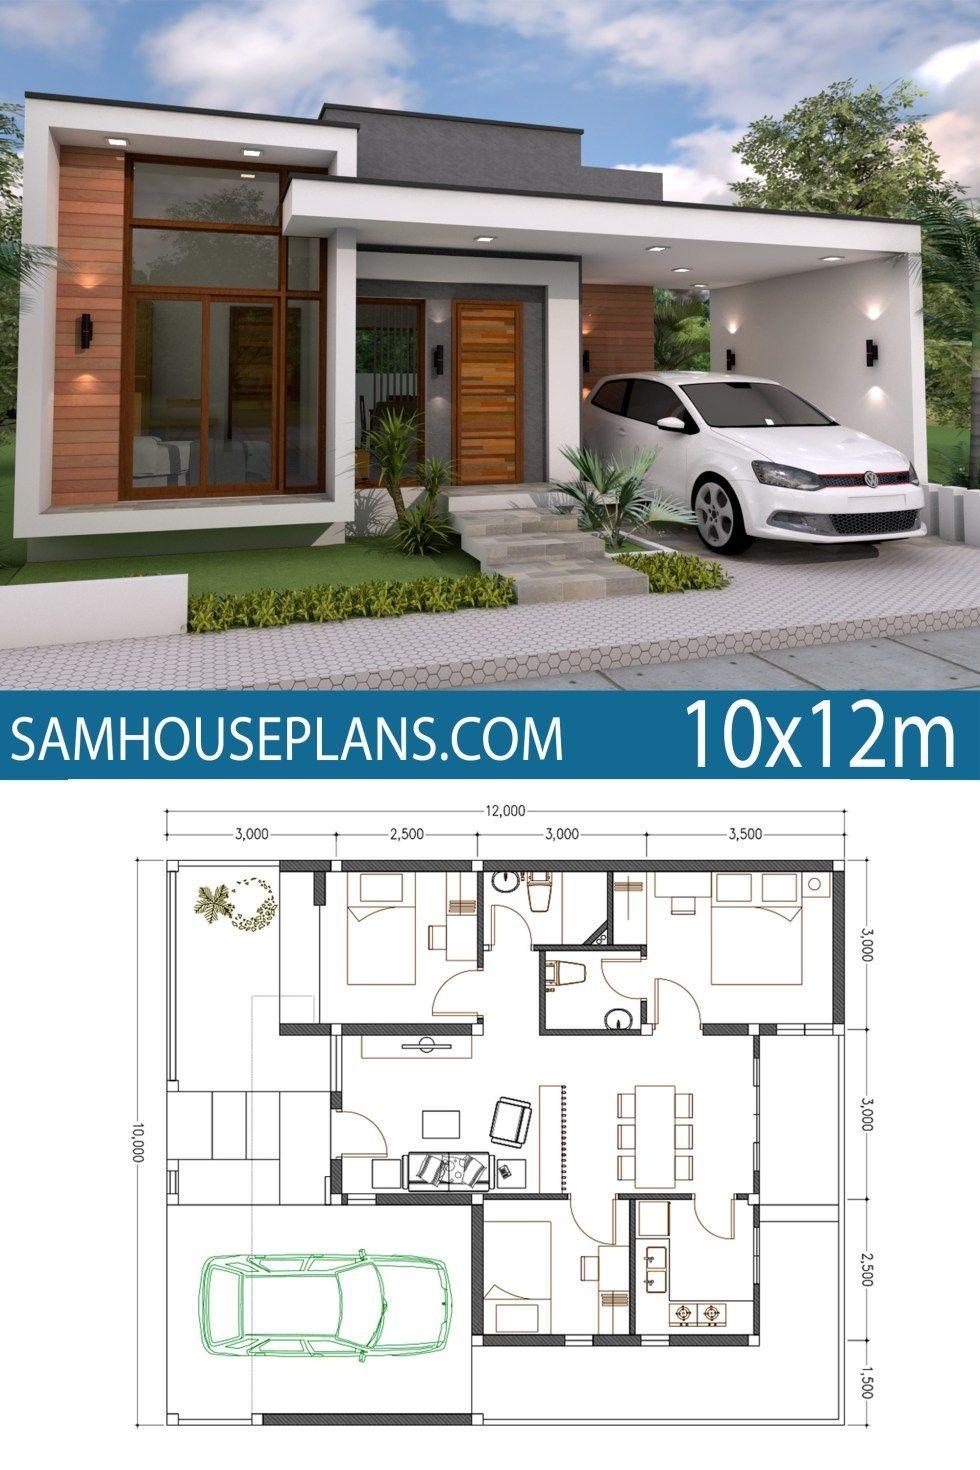 Home Plan 10x12m 3 Bedrooms Sam House Plans Modern